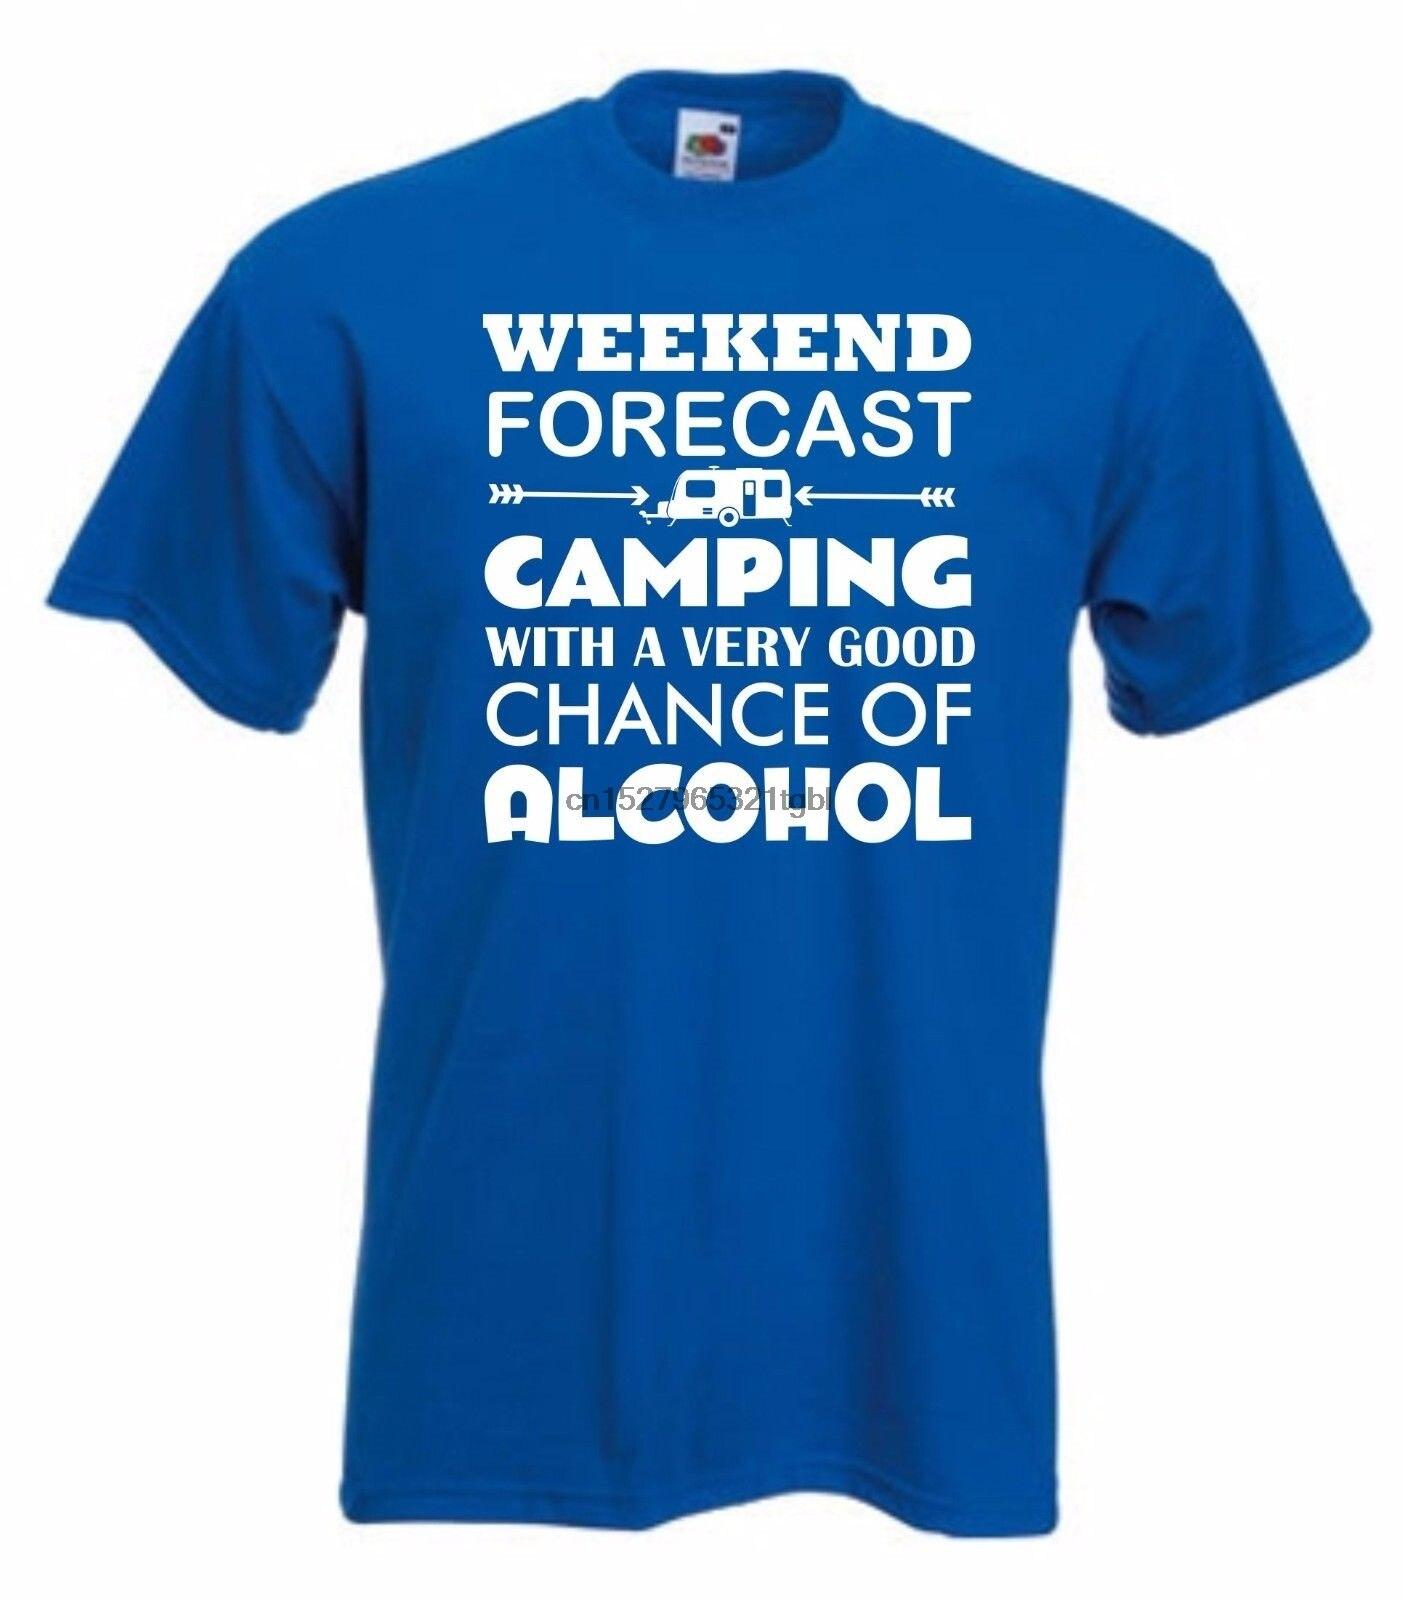 Caravana Alcohol camiseta divertida camiseta FIN DE SEMANA camiseta vino cerveza S-XXXL nuevas camisetas divertidas camisetas